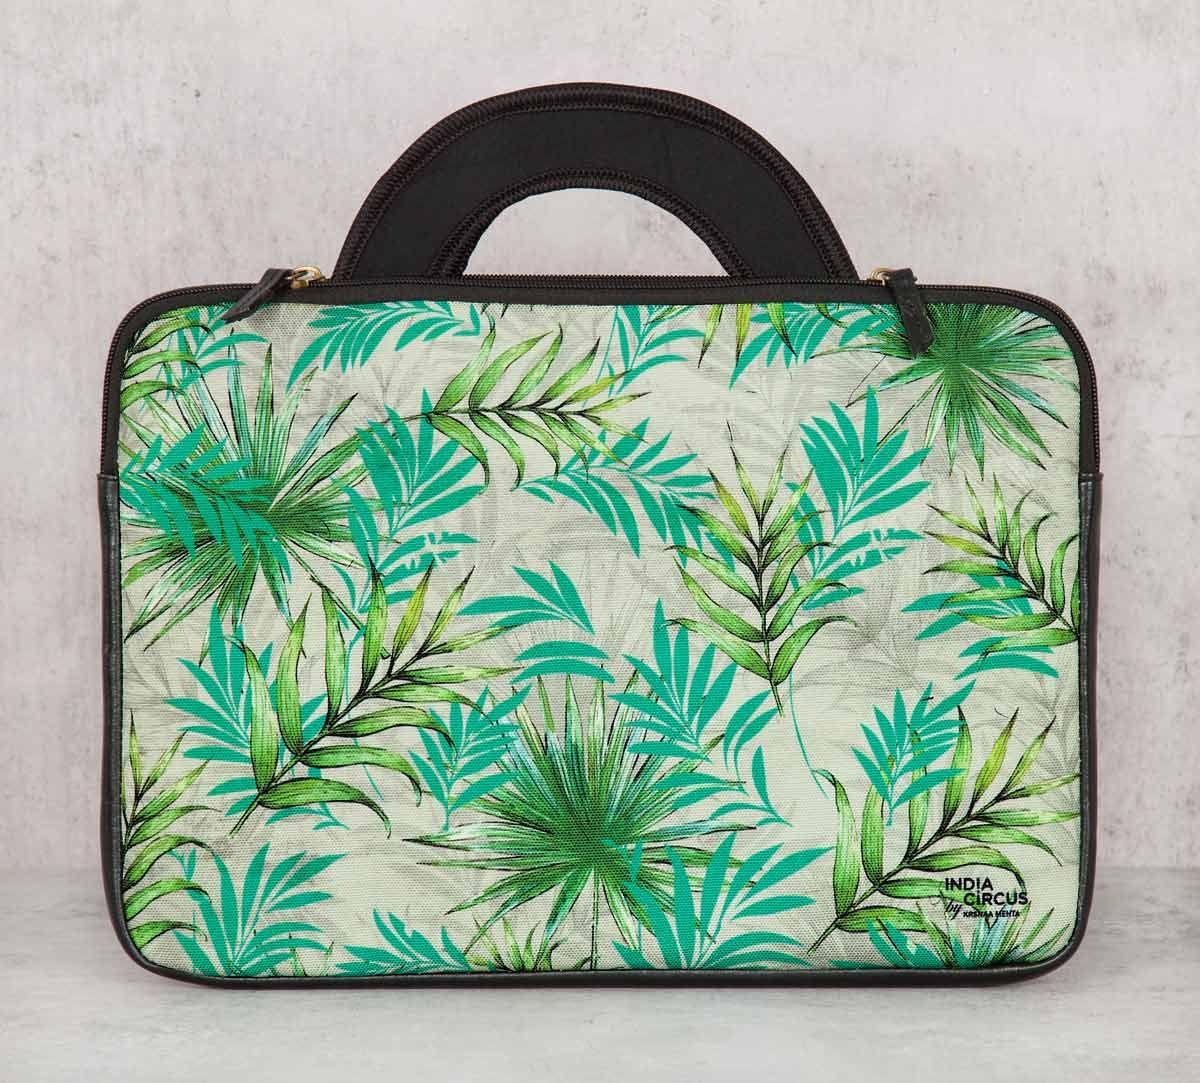 India Circus Tropical Fall 13-inch Laptop Bag